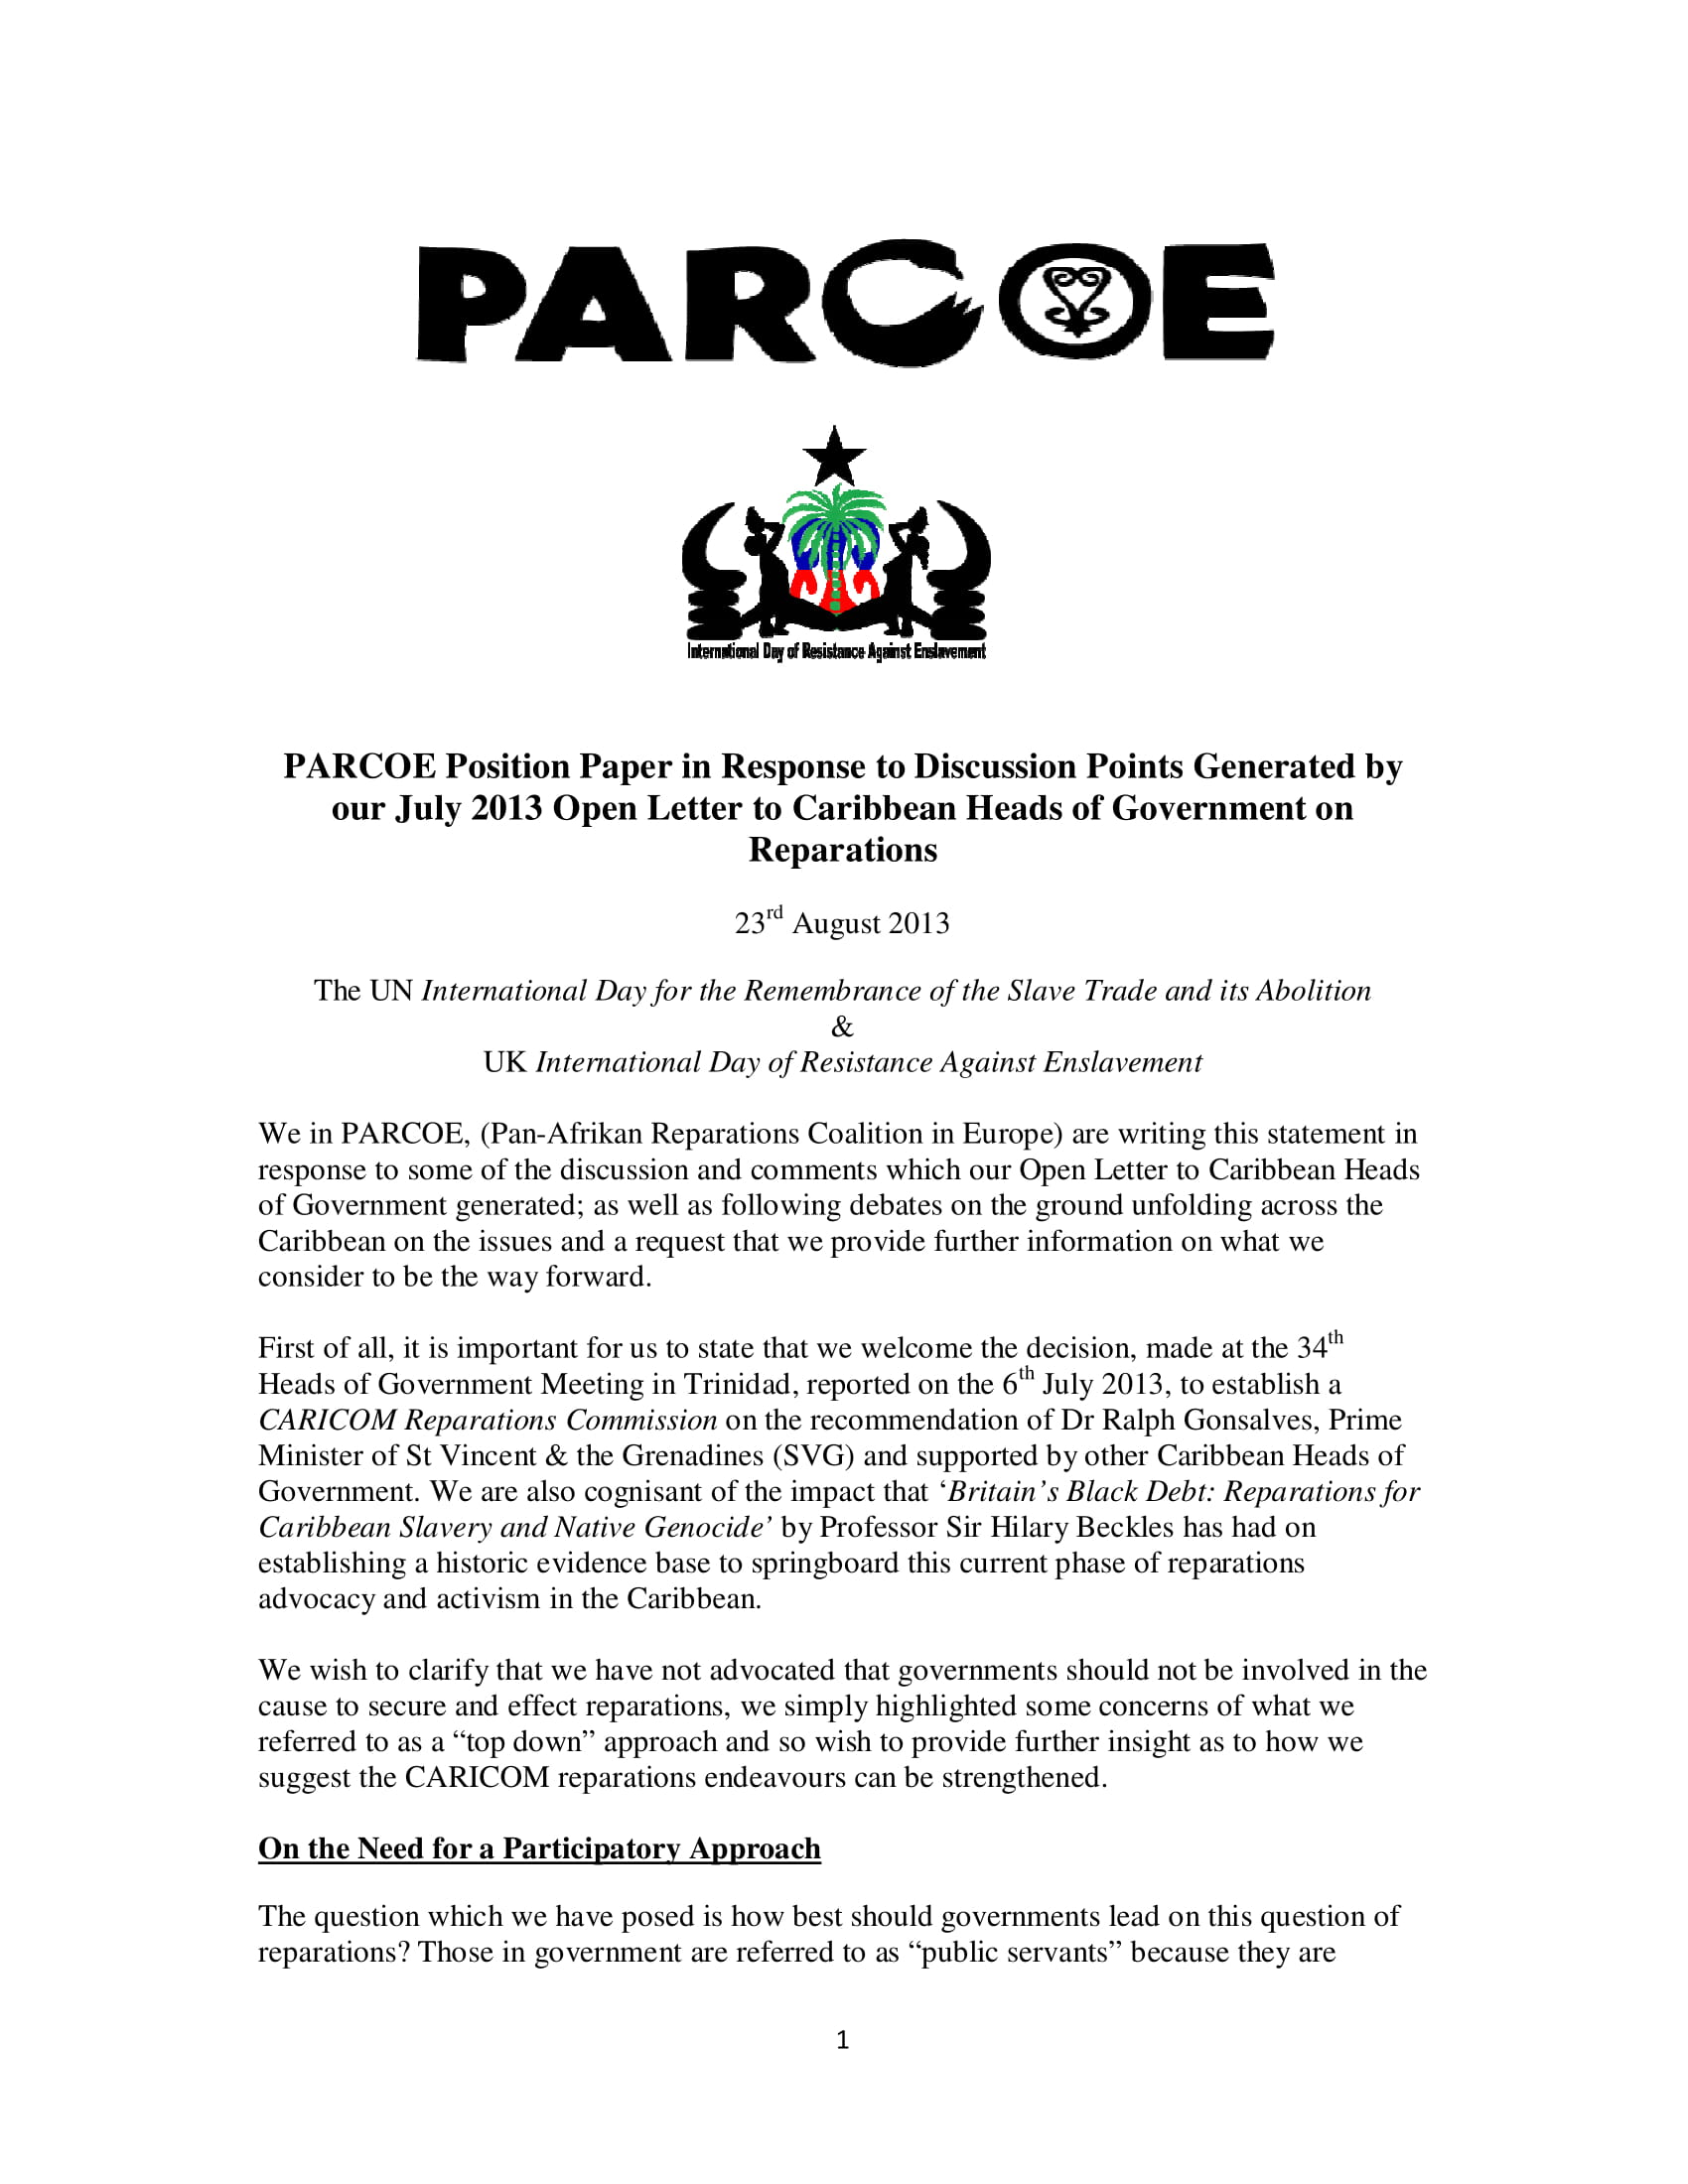 PARCOE CARICOM REPARATIONS POSITION PAPER-01